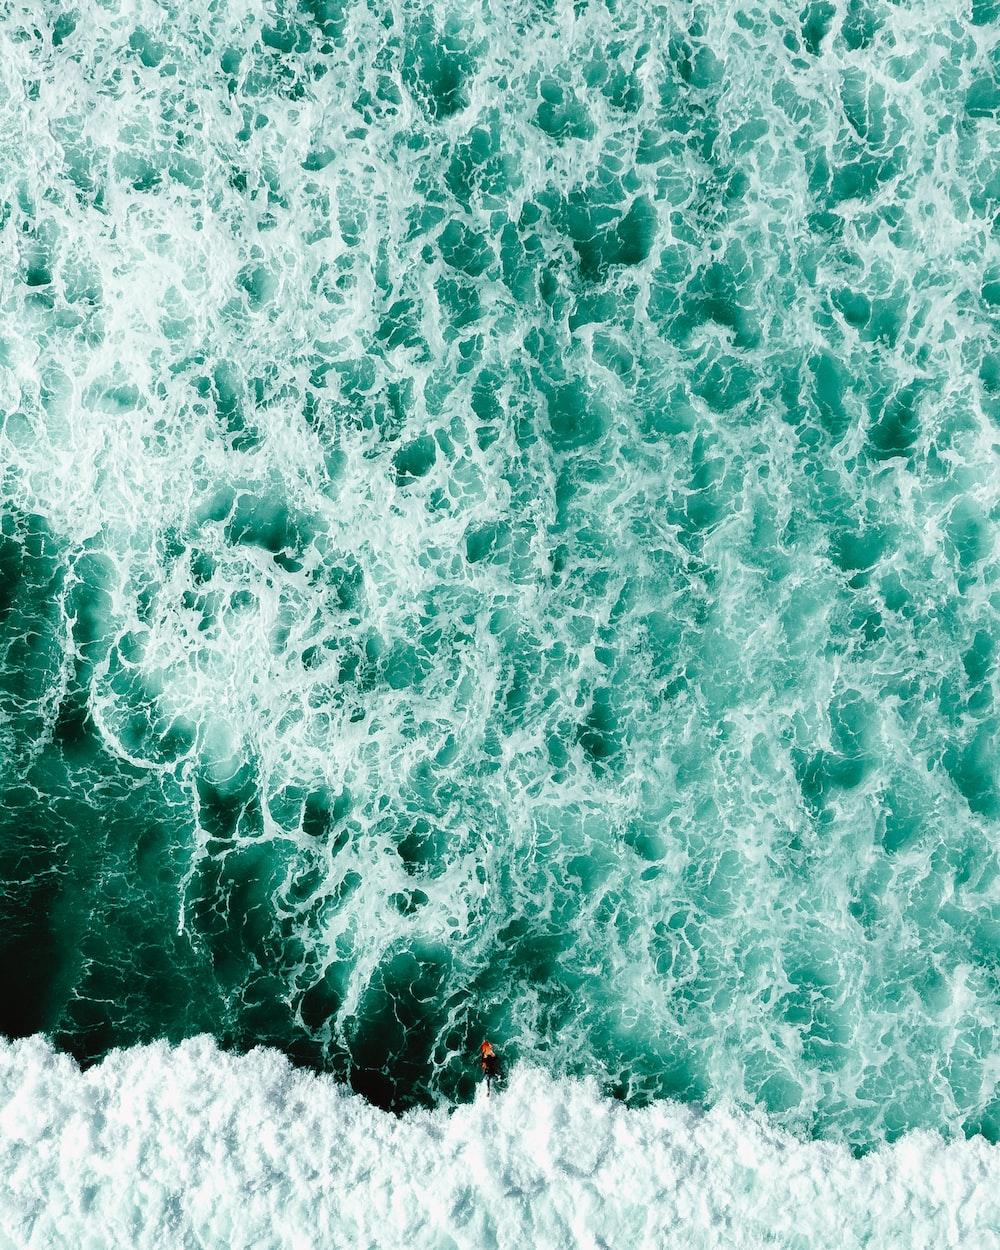 sea water crashes on rocks